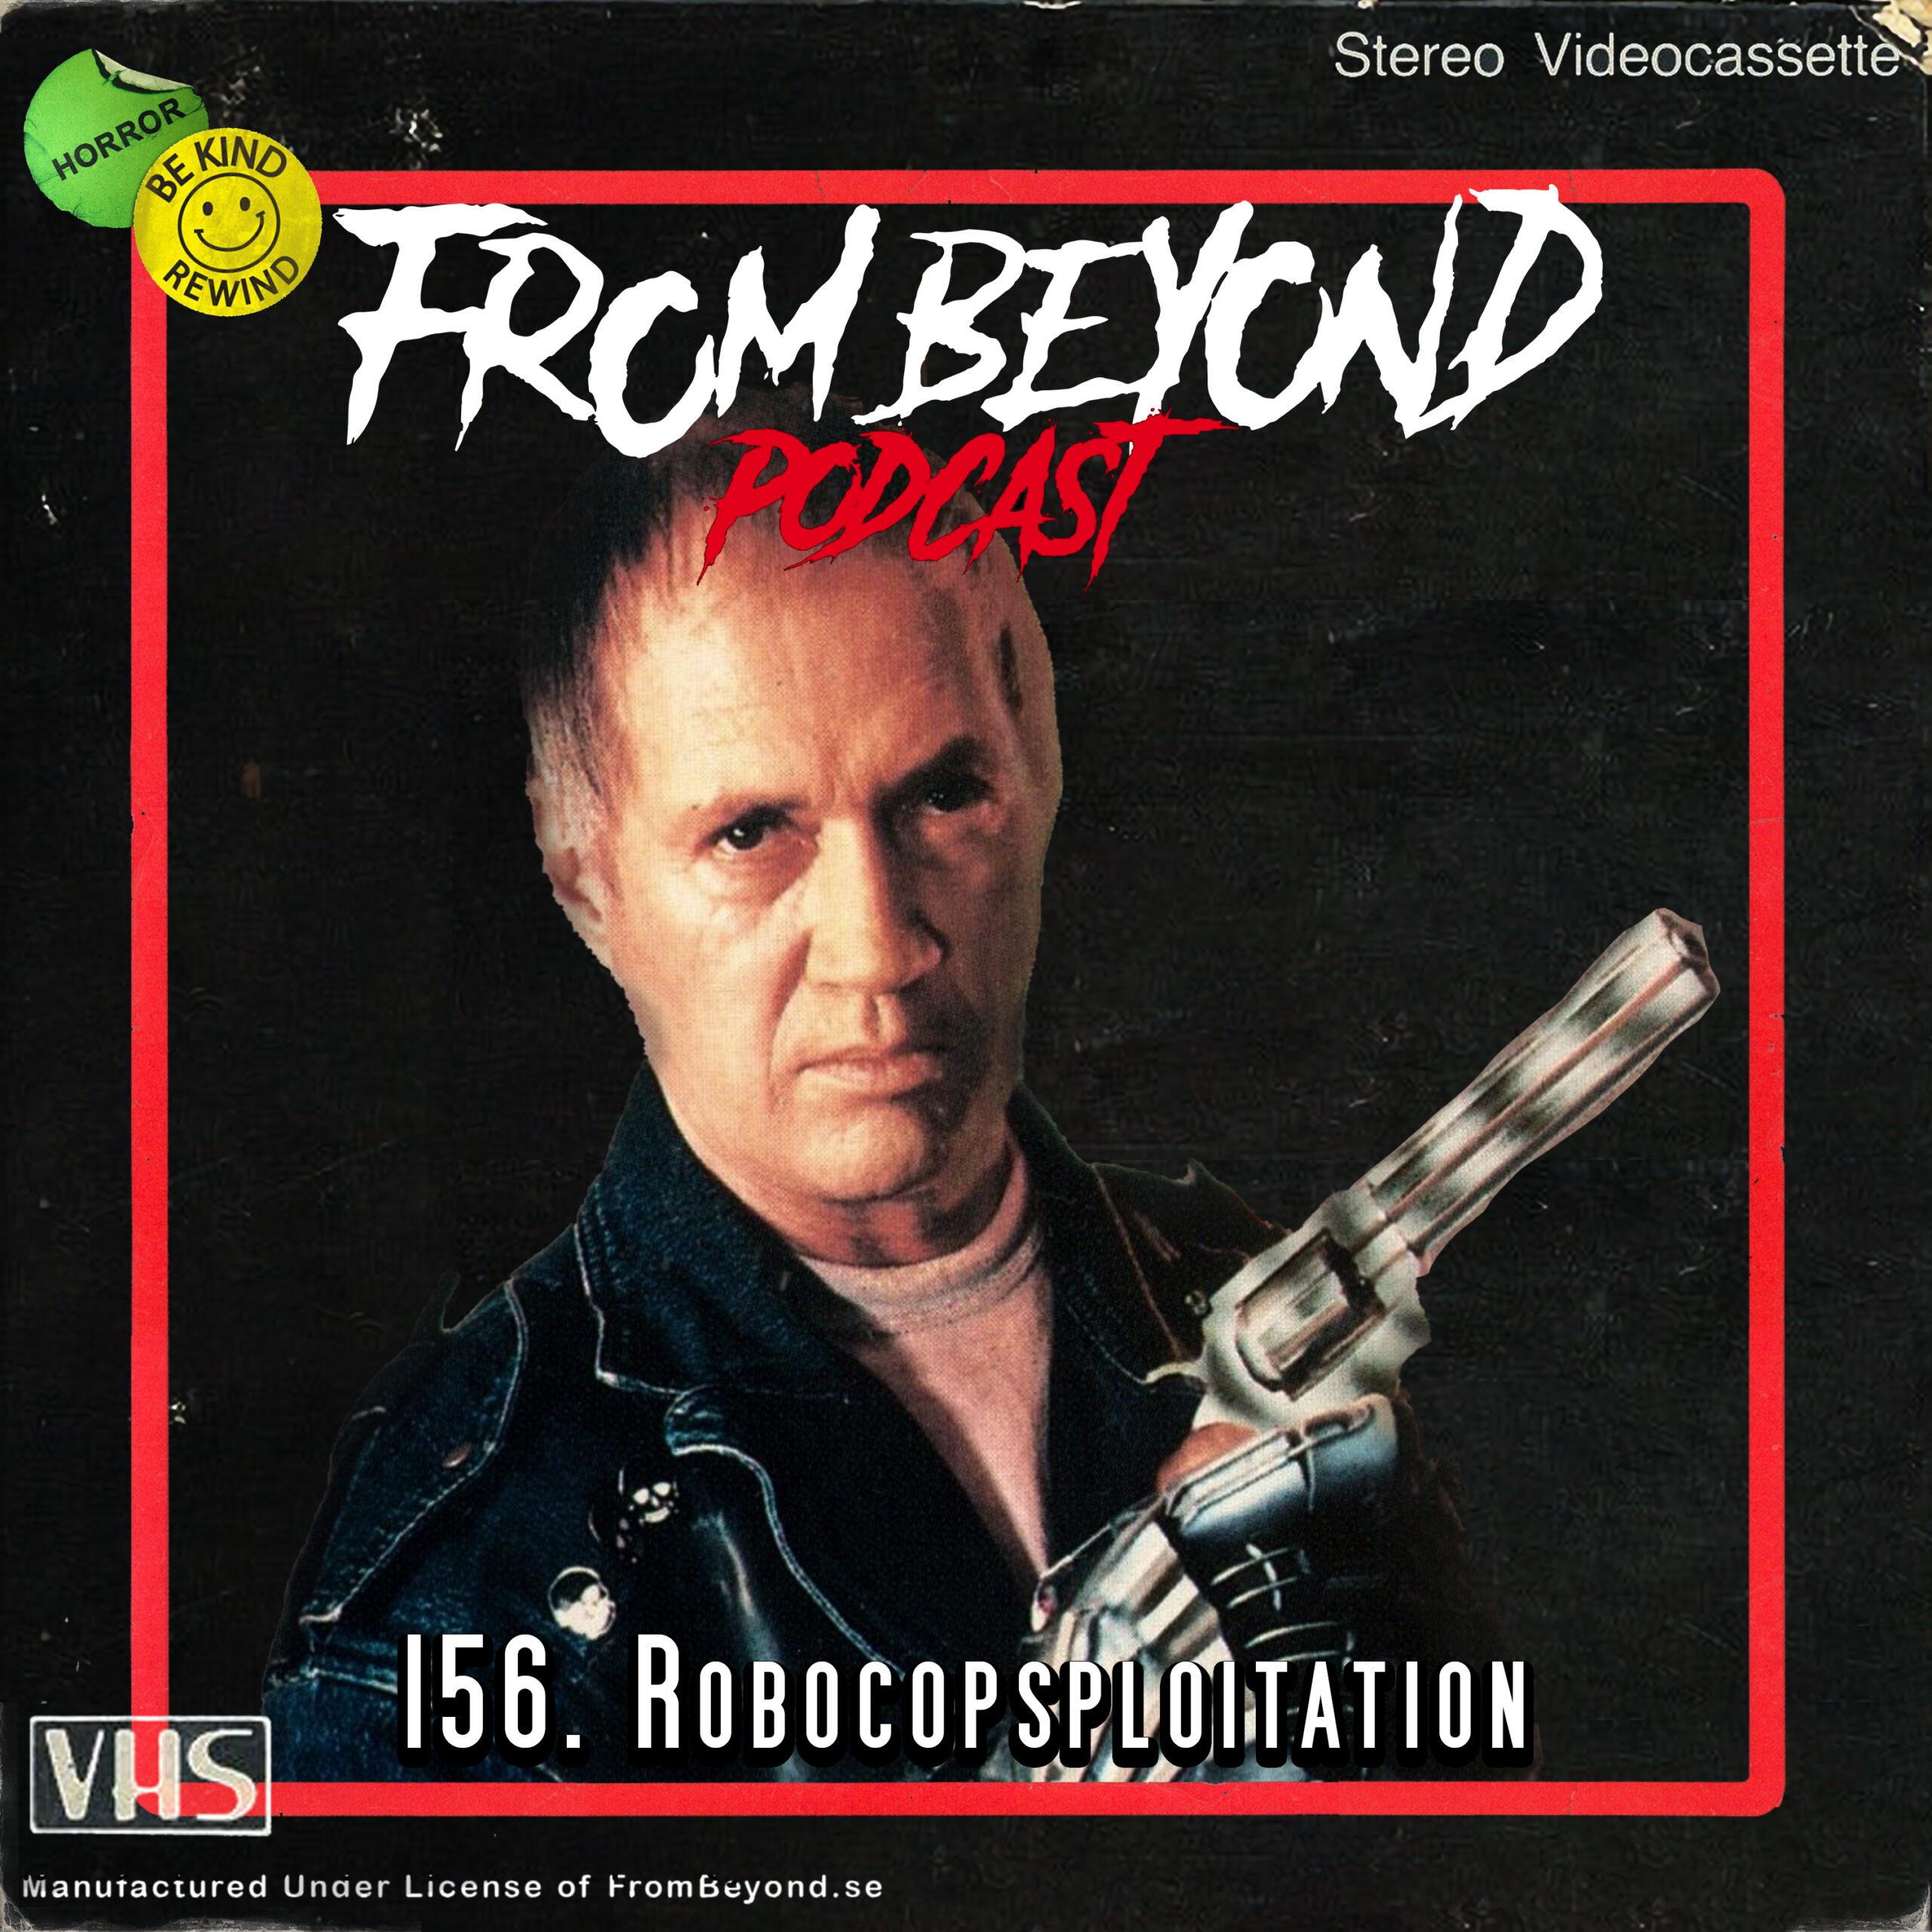 #156 – Robocopsploitation